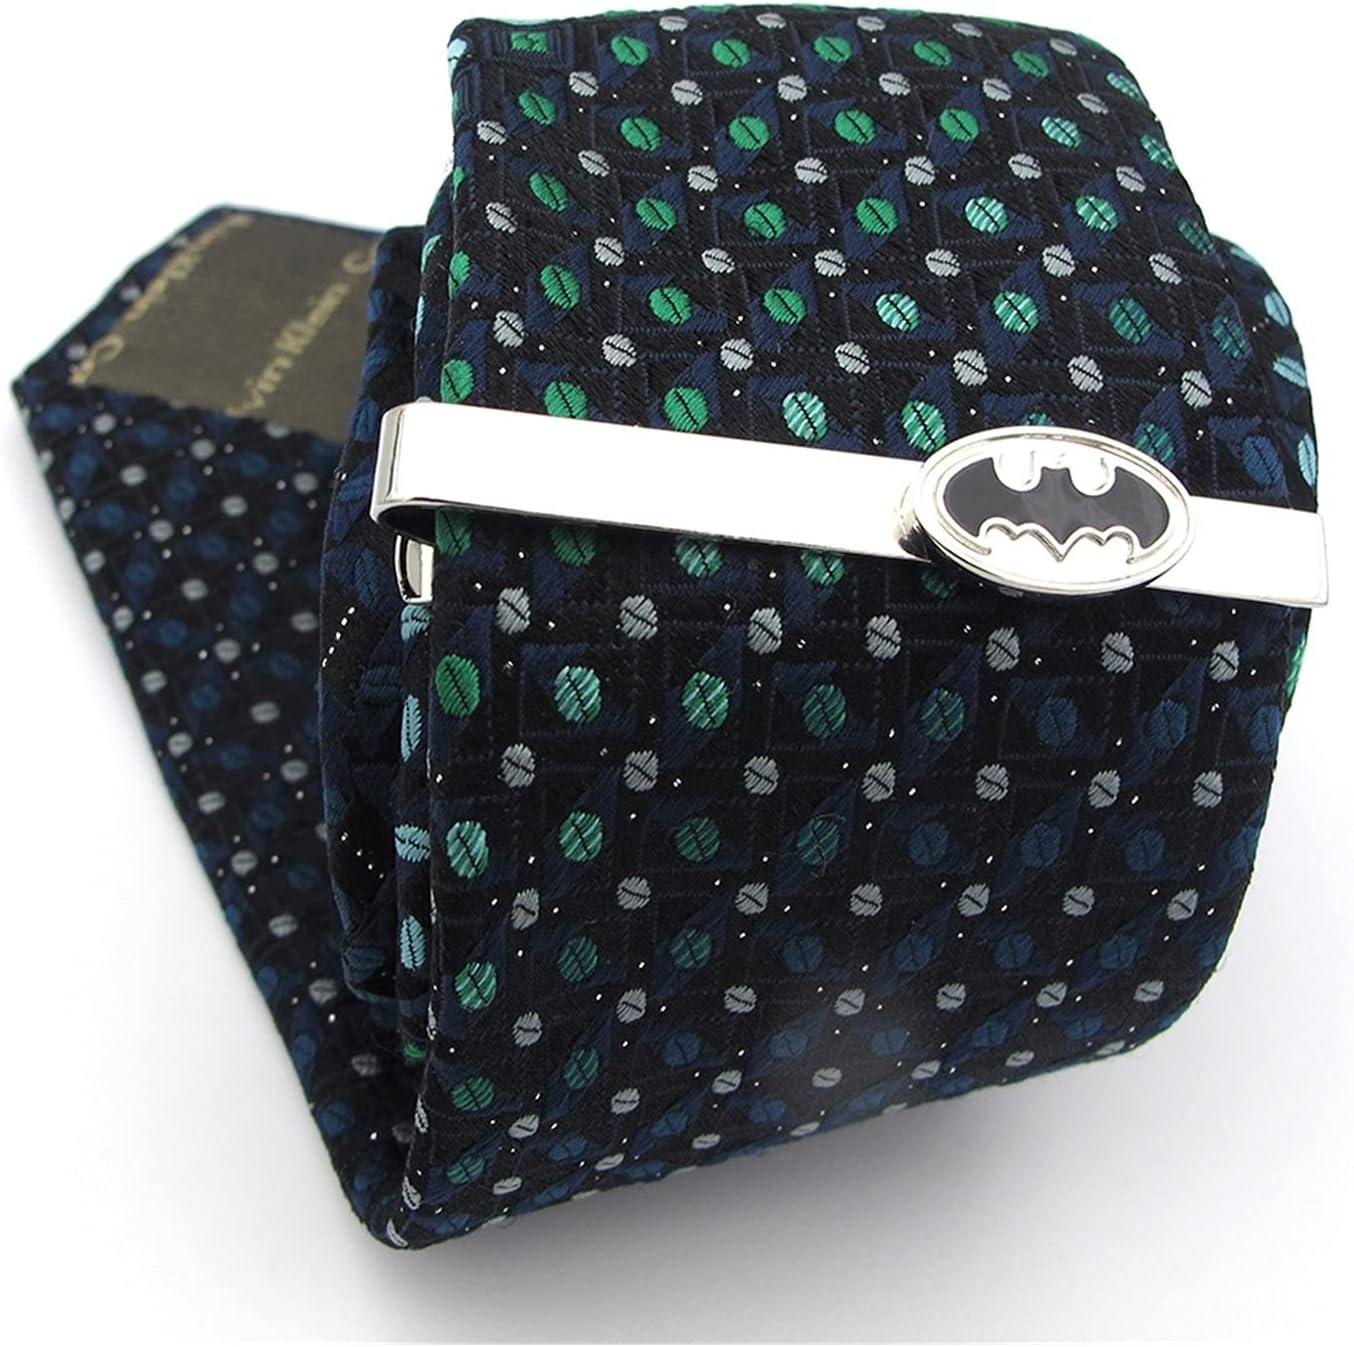 chenfeng Tie Clips Superheroes Bat Design Tie Clips for Men Quality Copper Material Black Color